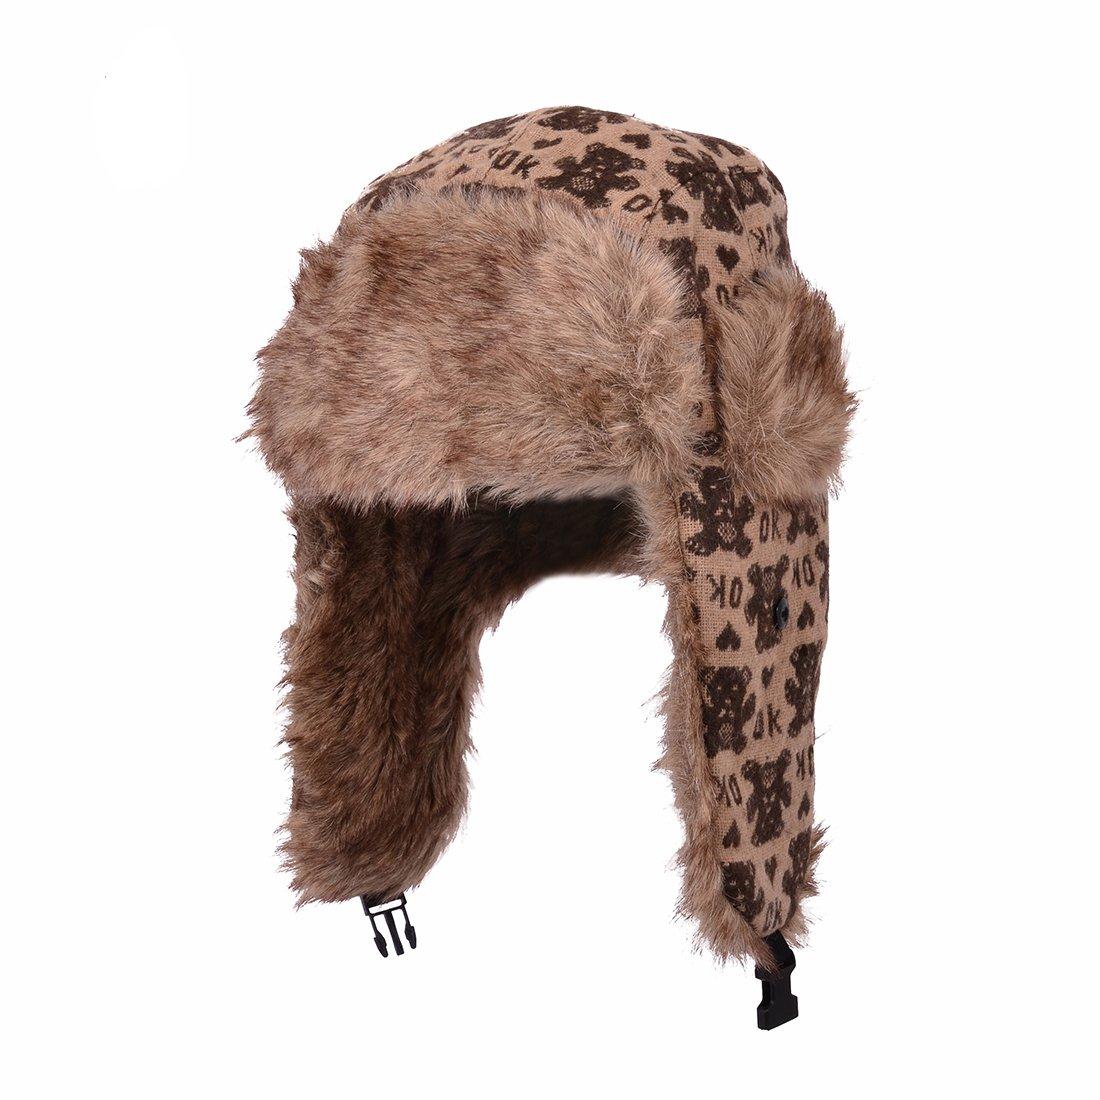 Huan Xun Red Deer Toasty Fleece Lined Knitted Ear Flap Hats Jewellerygets NL-2181 B Red